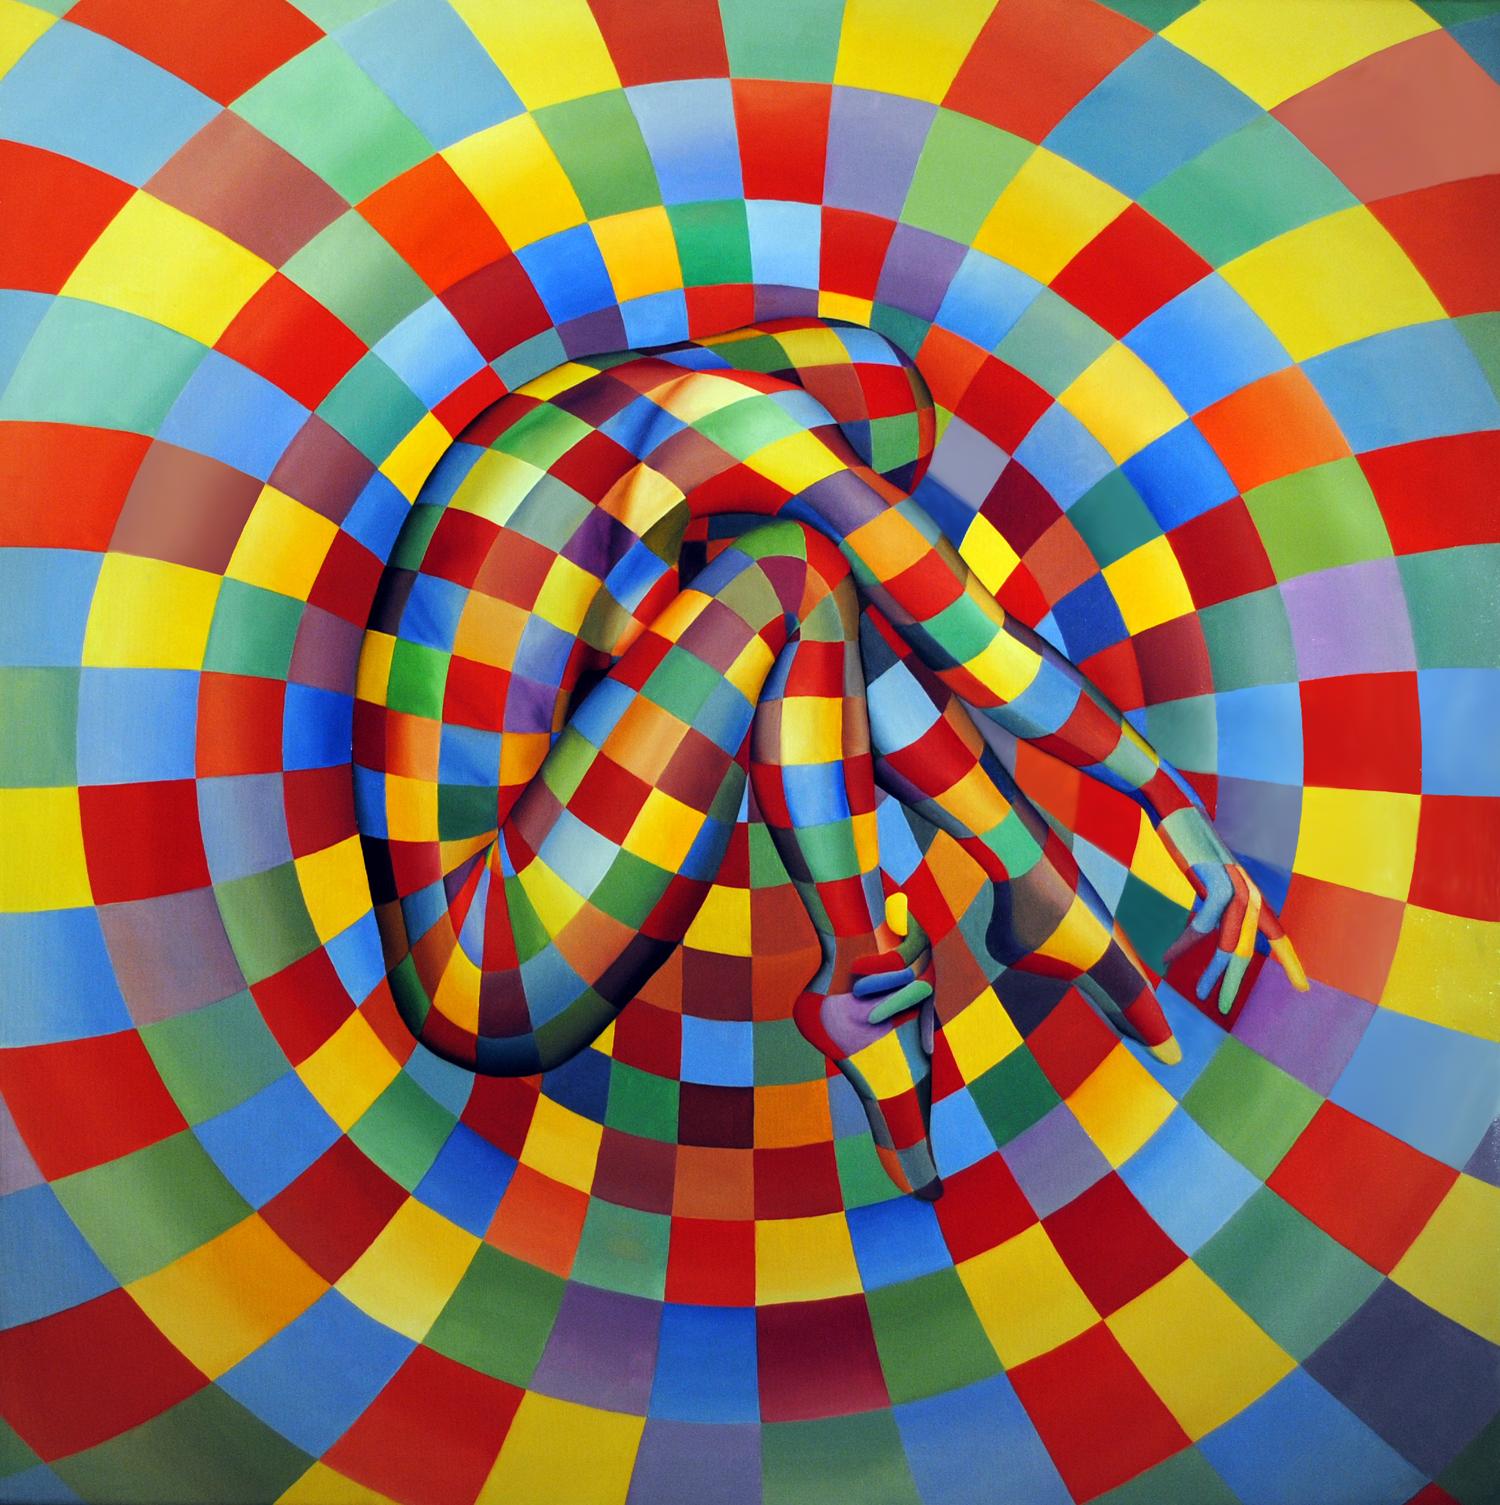 nuncalosabre.Pinturas - Danilo Martinis